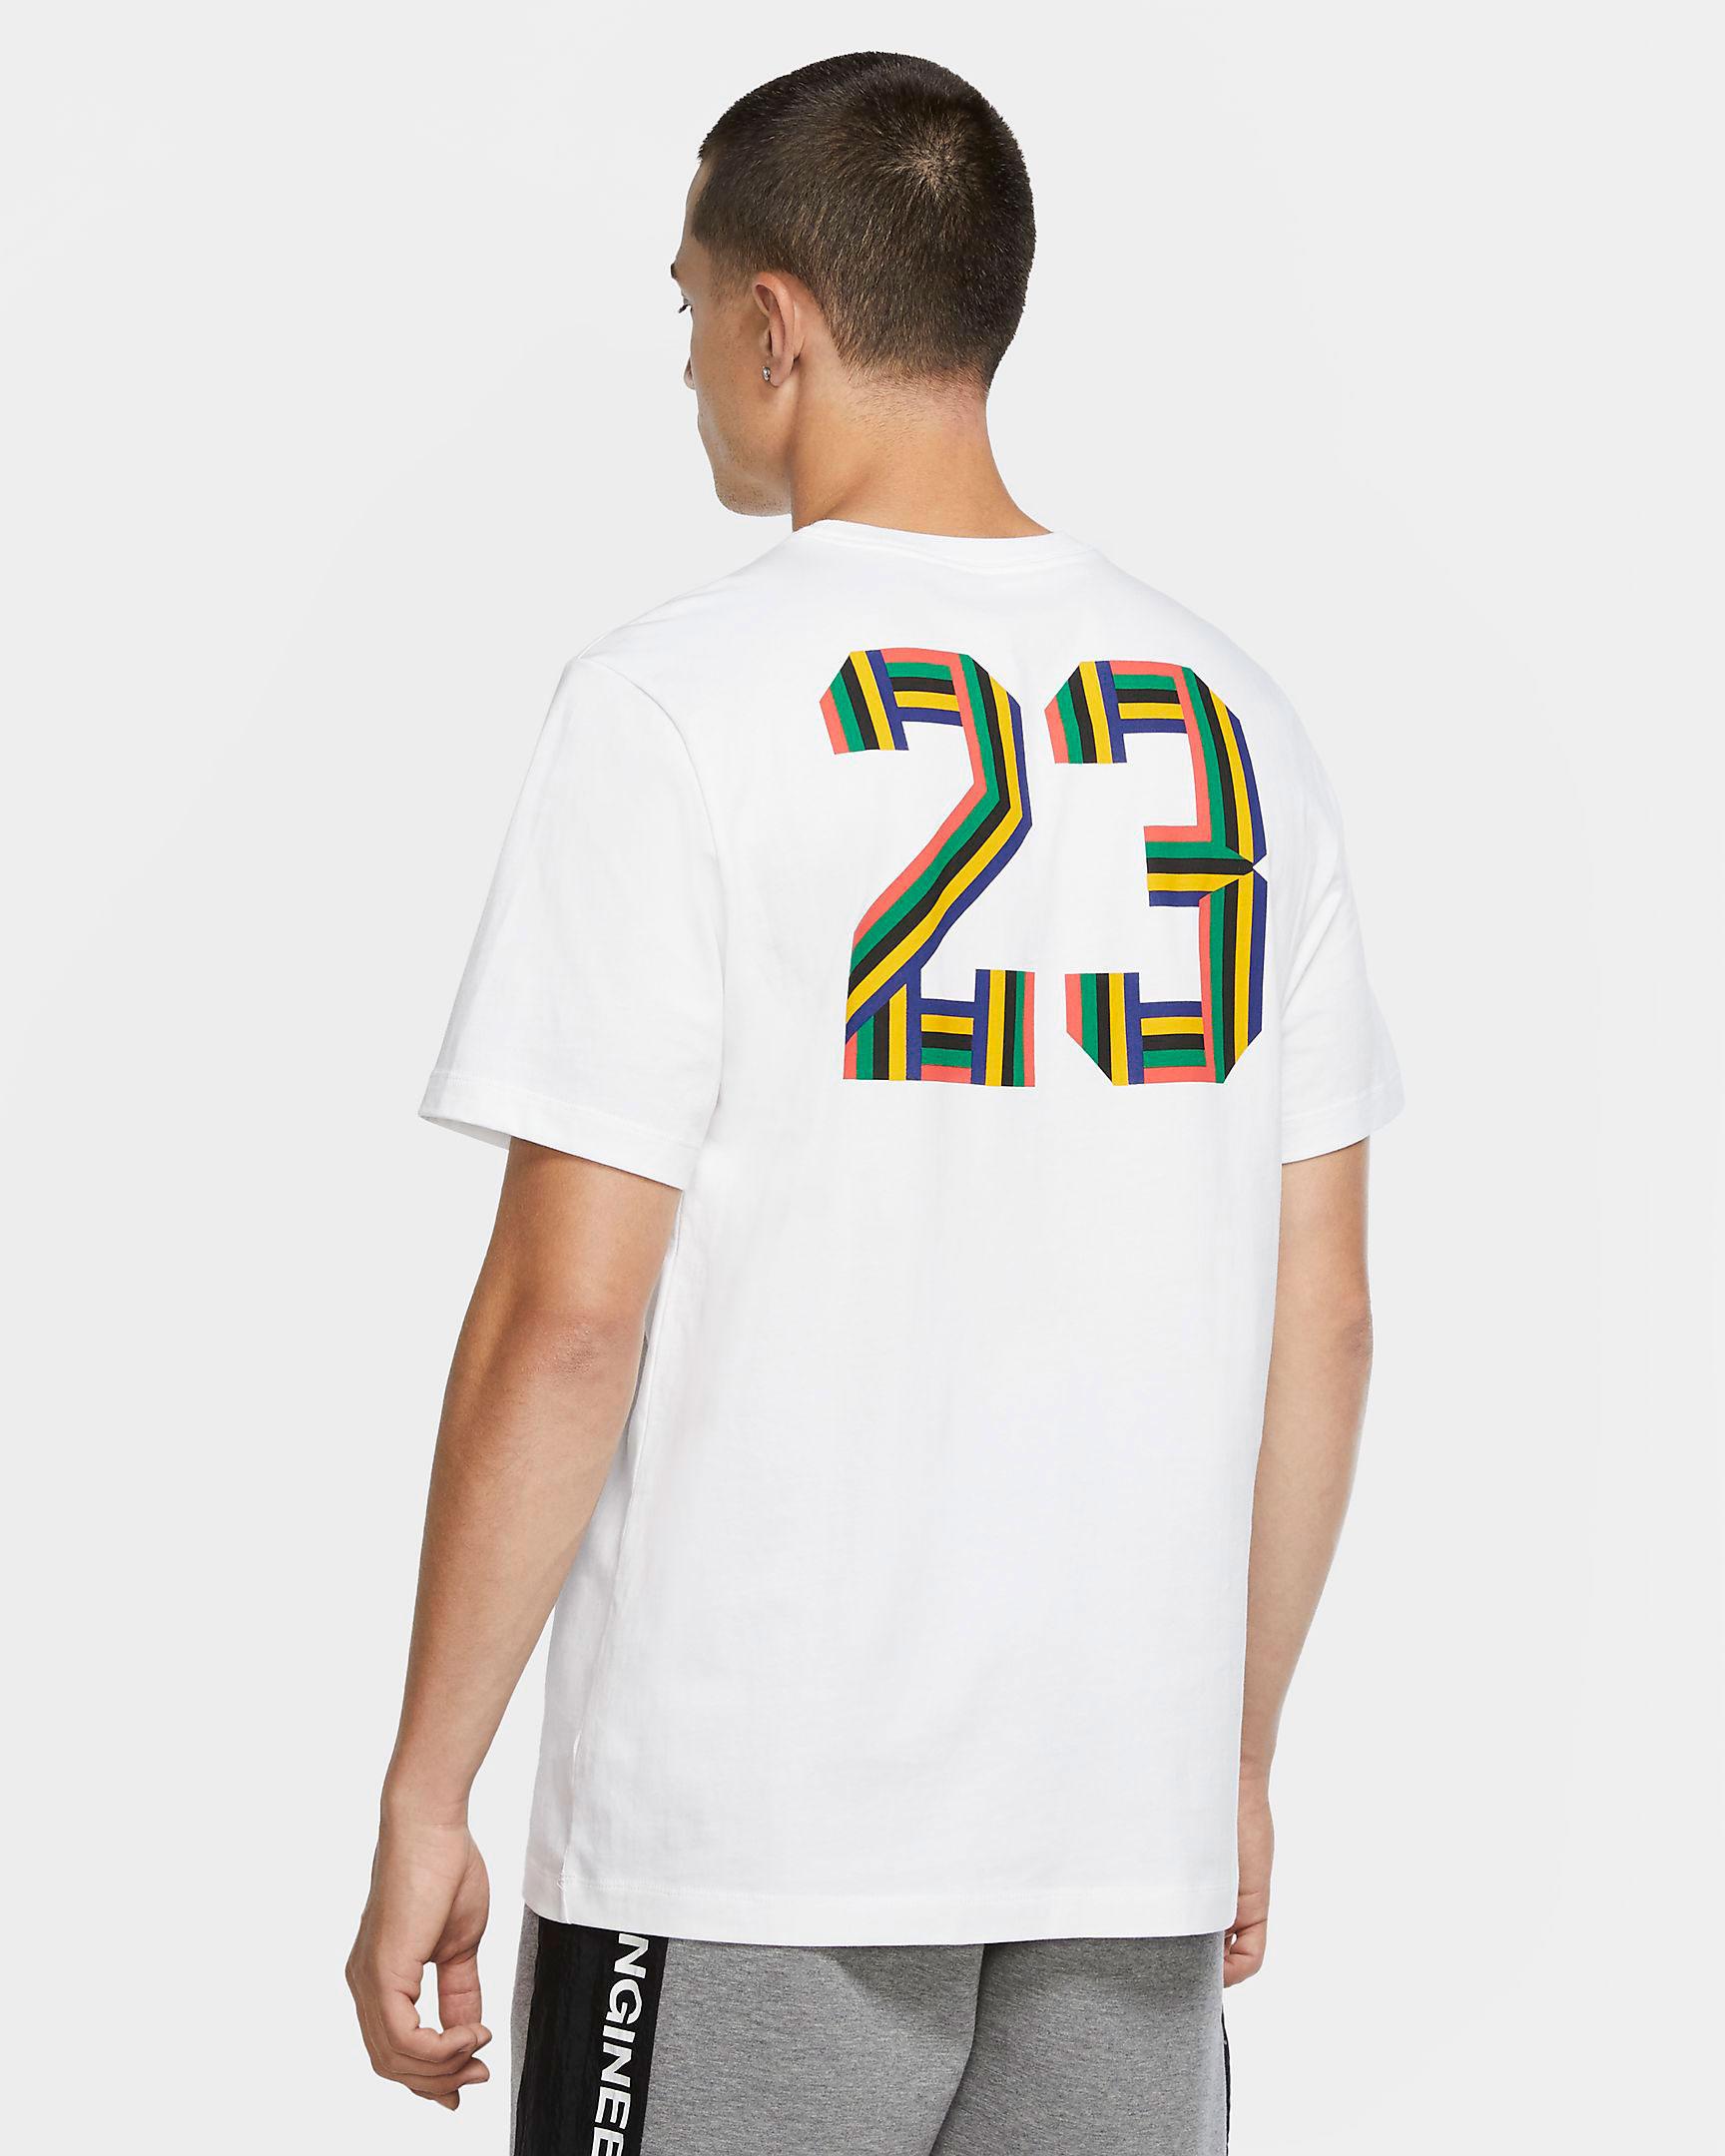 air-jordan-5-what-the-shirt-white-multi-color-2